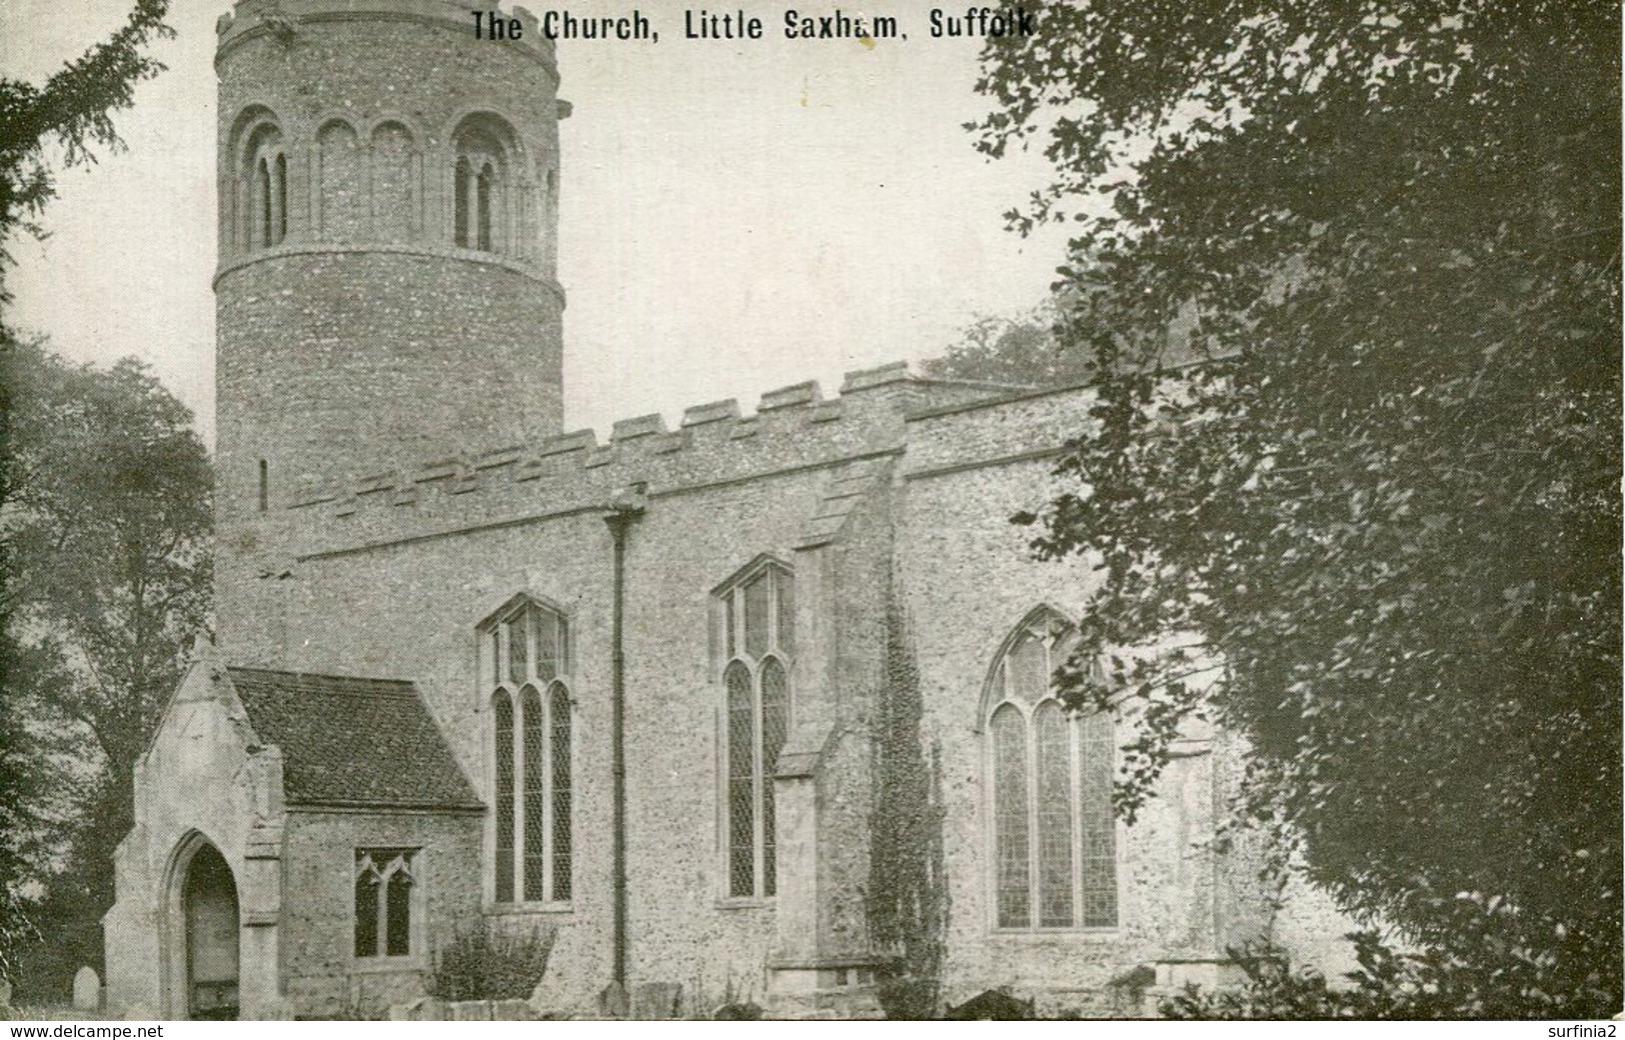 SUFFOLK - LITTLE SAXHAM - THE CHURCH Suf314 - England